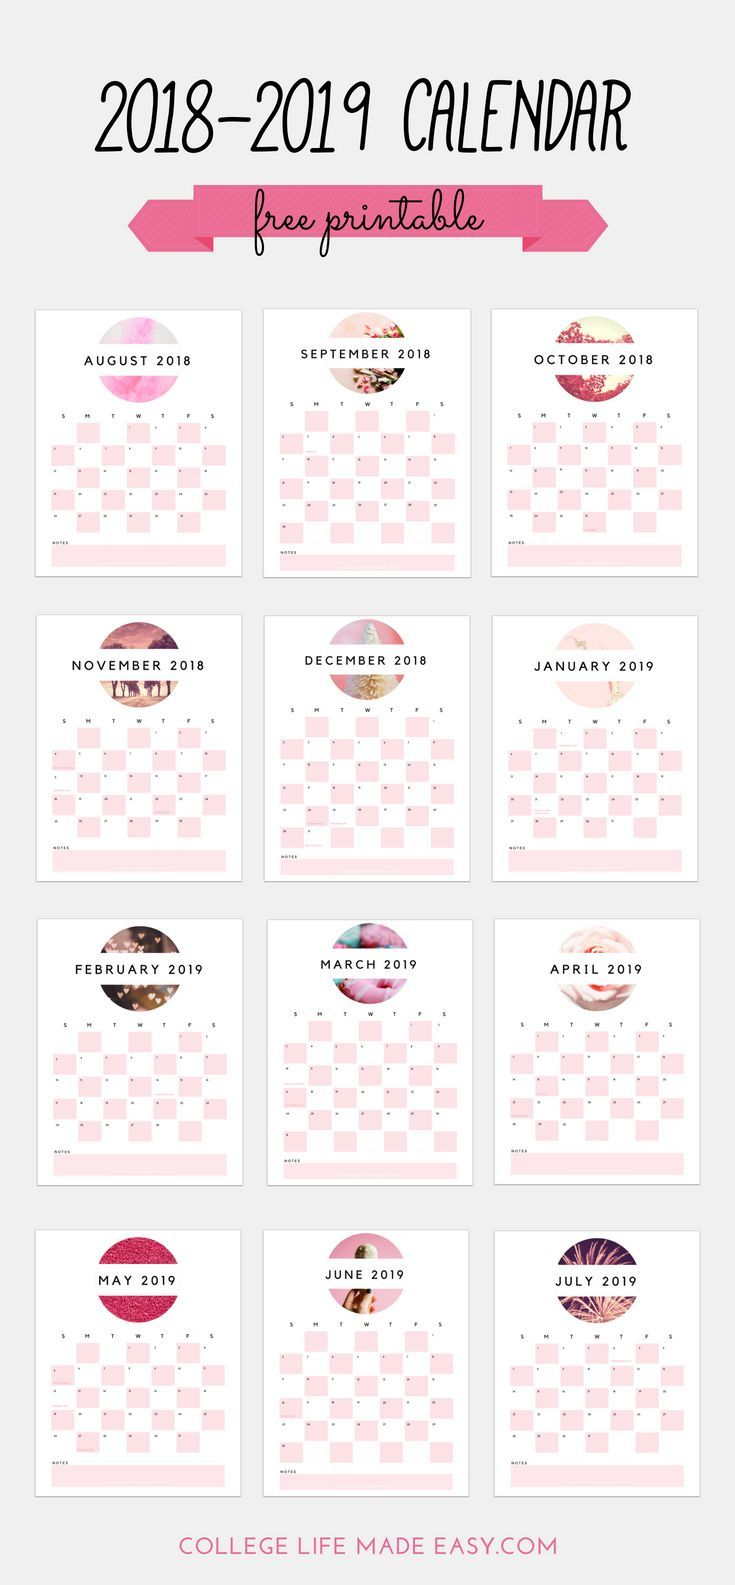 Free 2018 2019 Printable Calendar Cute In Soft Pink